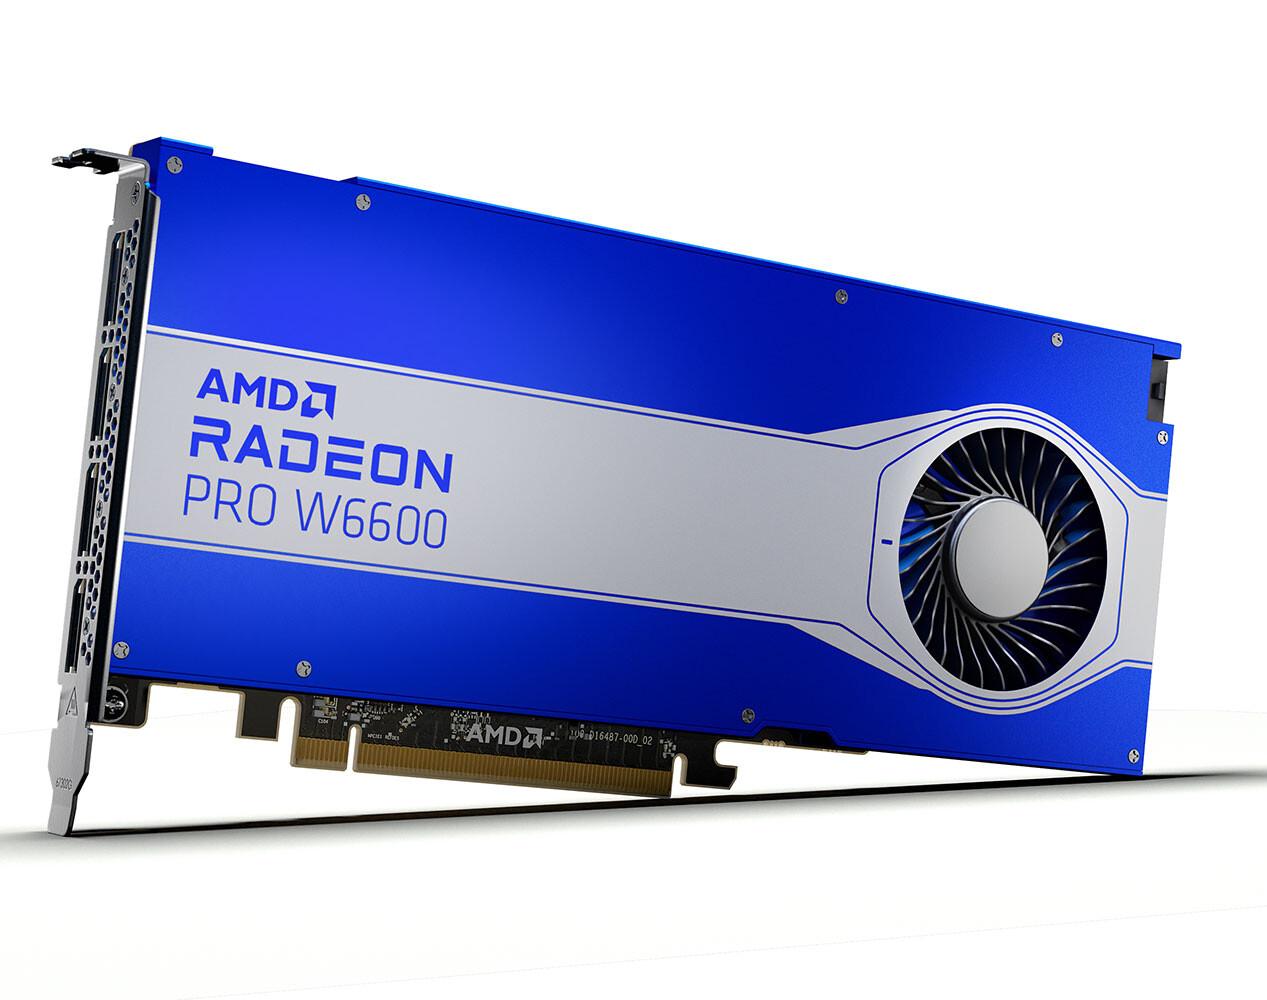 Radeon_Pro_w6600_1.jpg